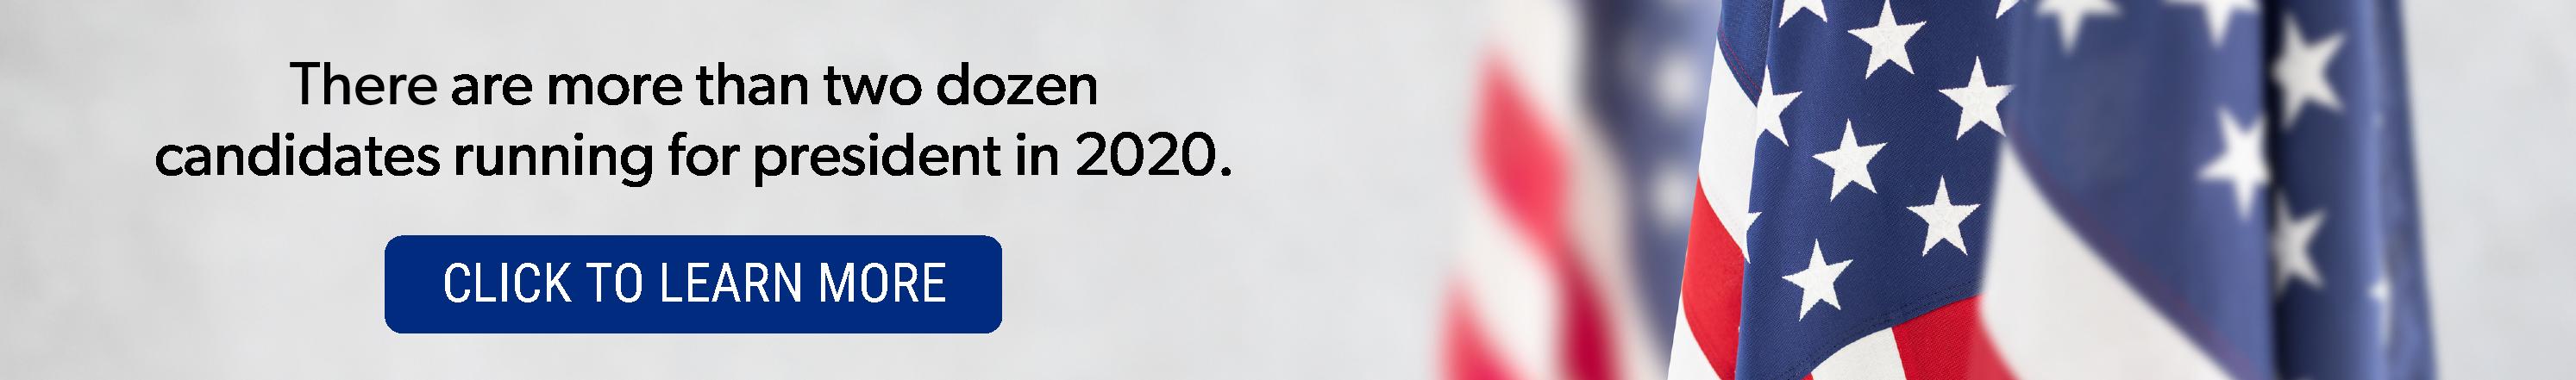 Steve Bullock presidential campaign, 2020 - Ballotpedia